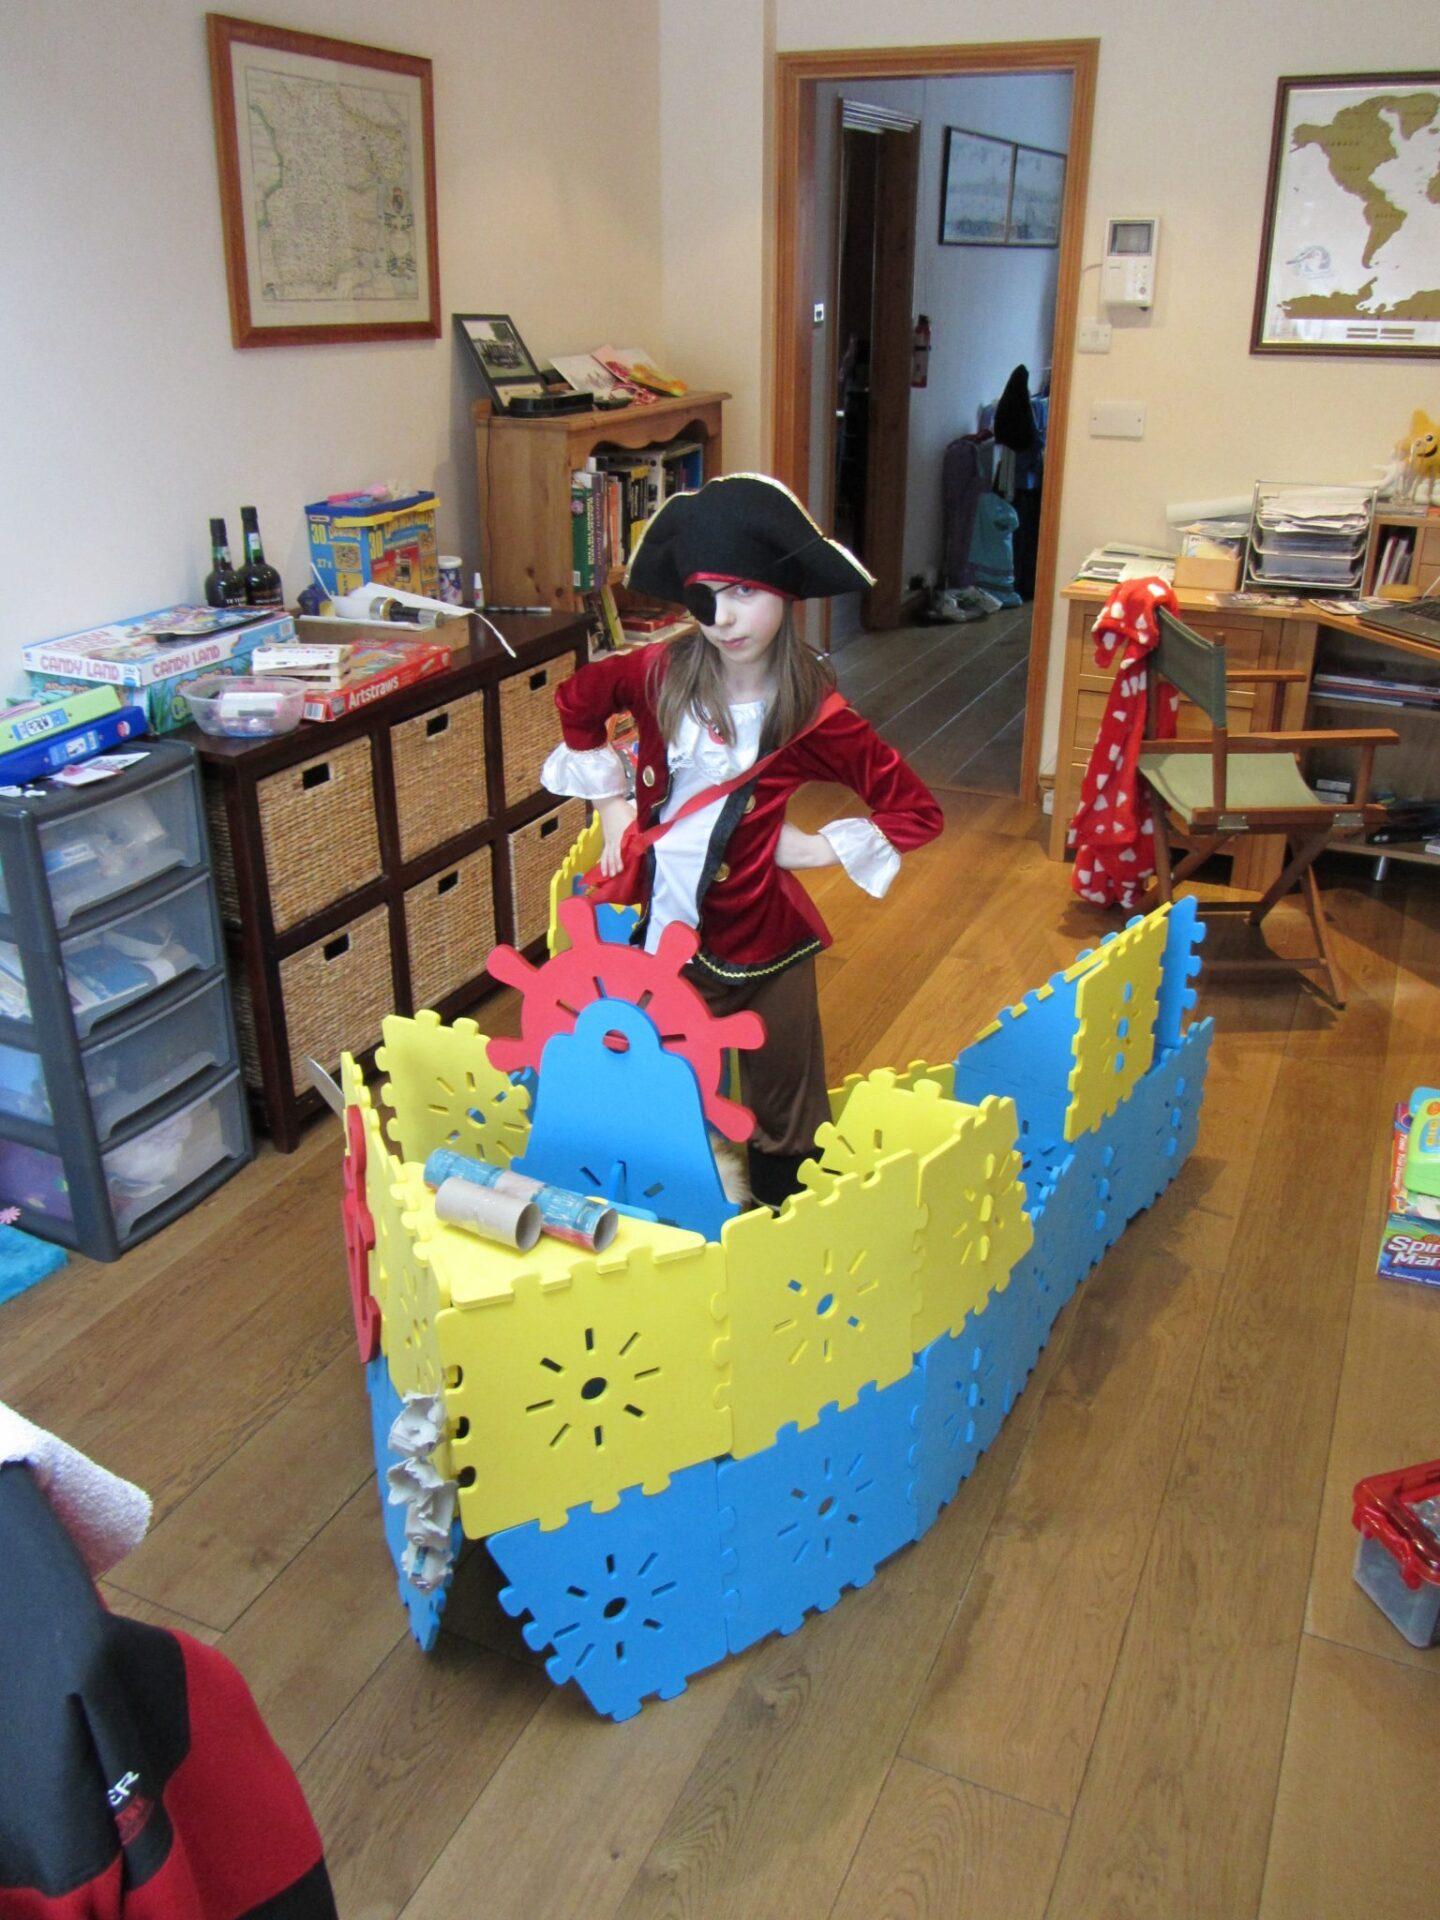 Soft-building-playset-toys-NUPSA-pirate-ship